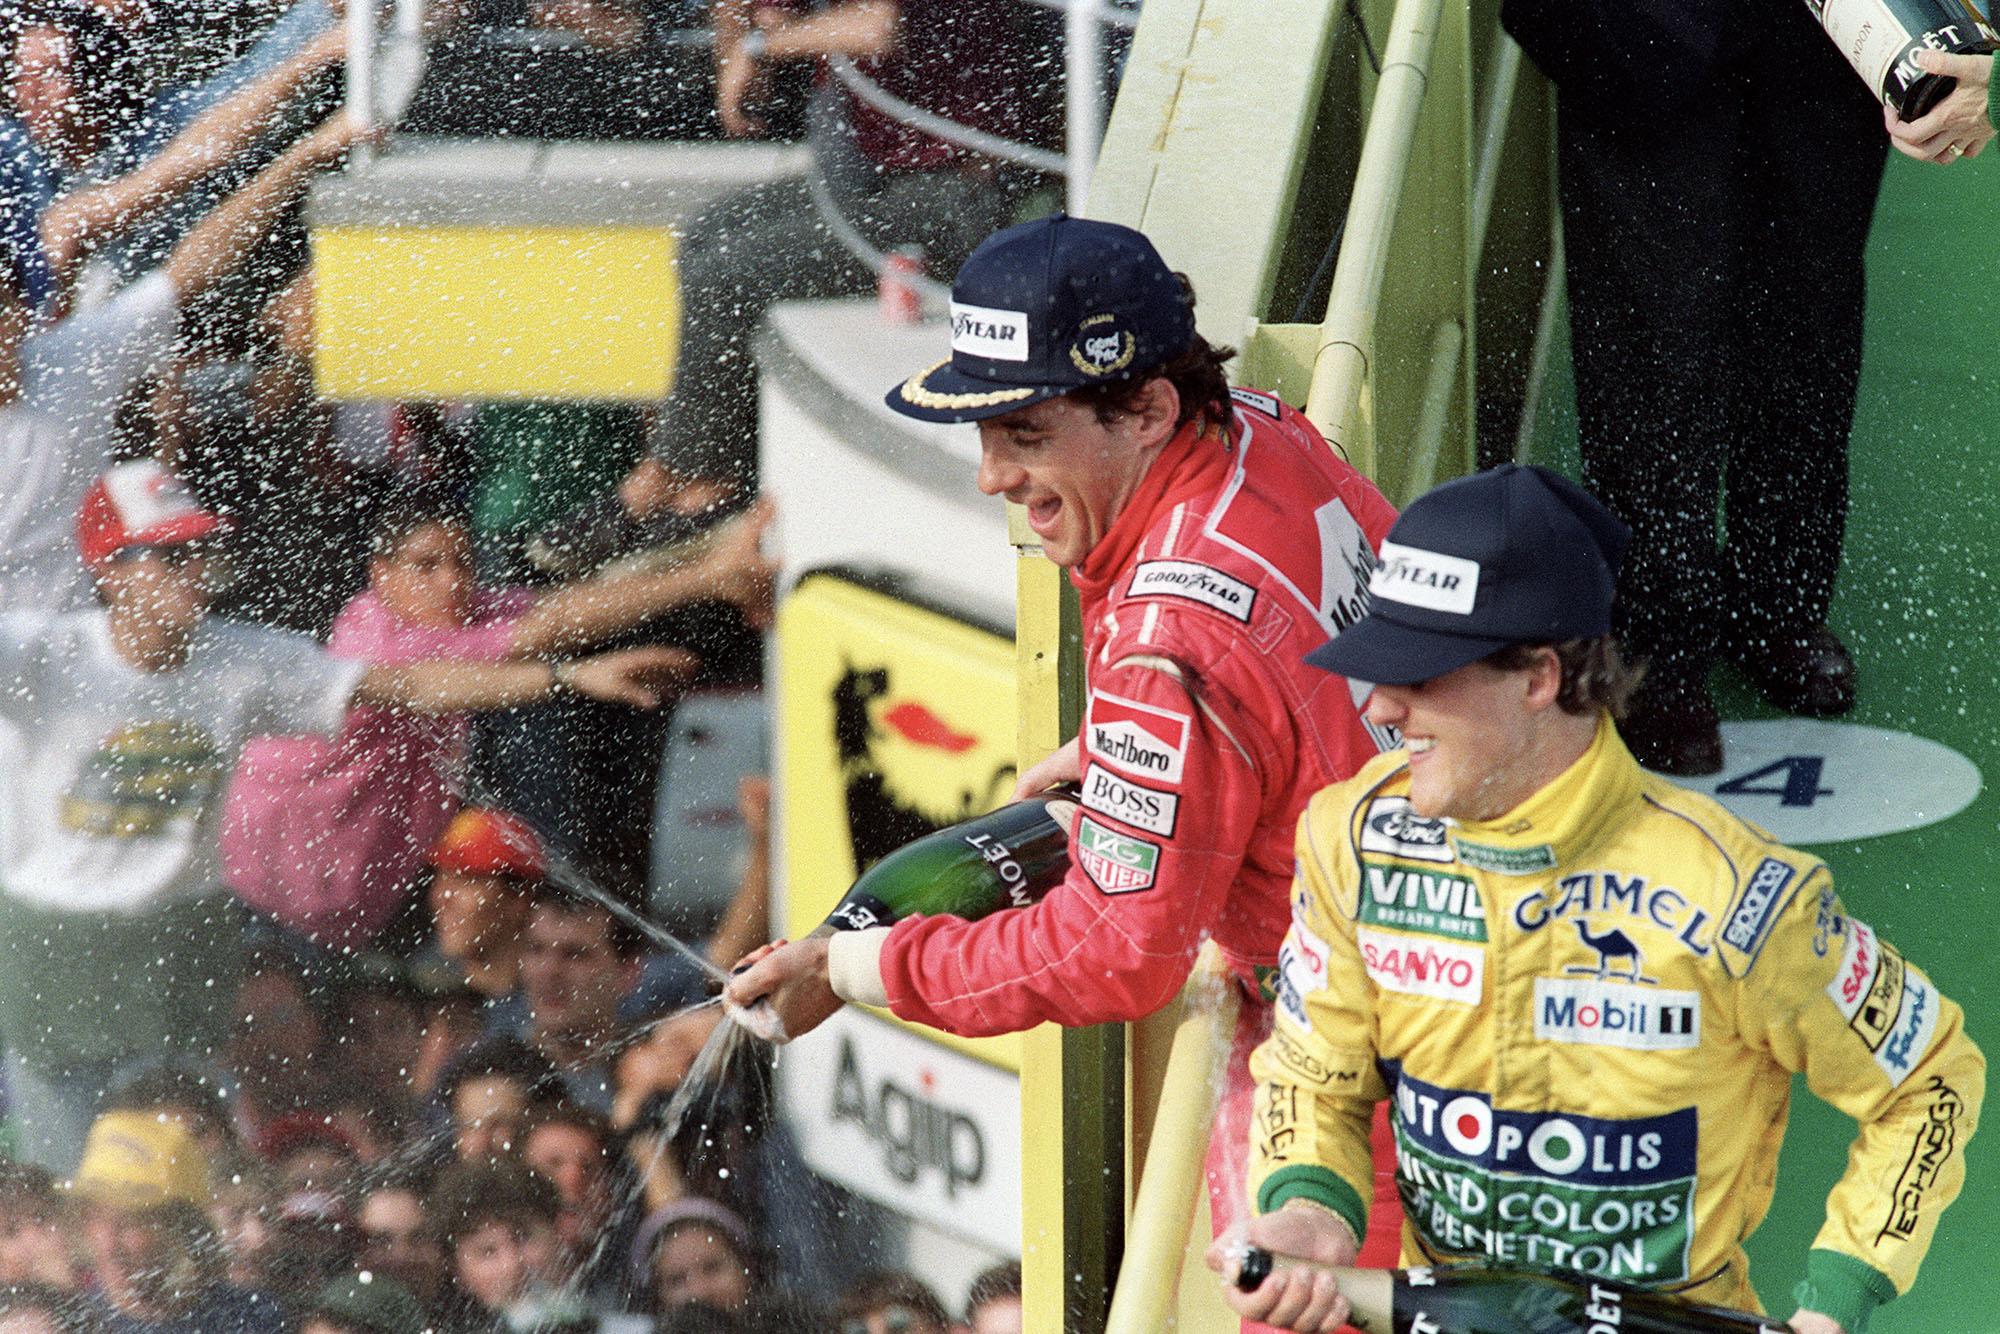 Ayrton Senna sprays champagne alongside Michael Schumacher after winning the 1992 Italian Grand Prix